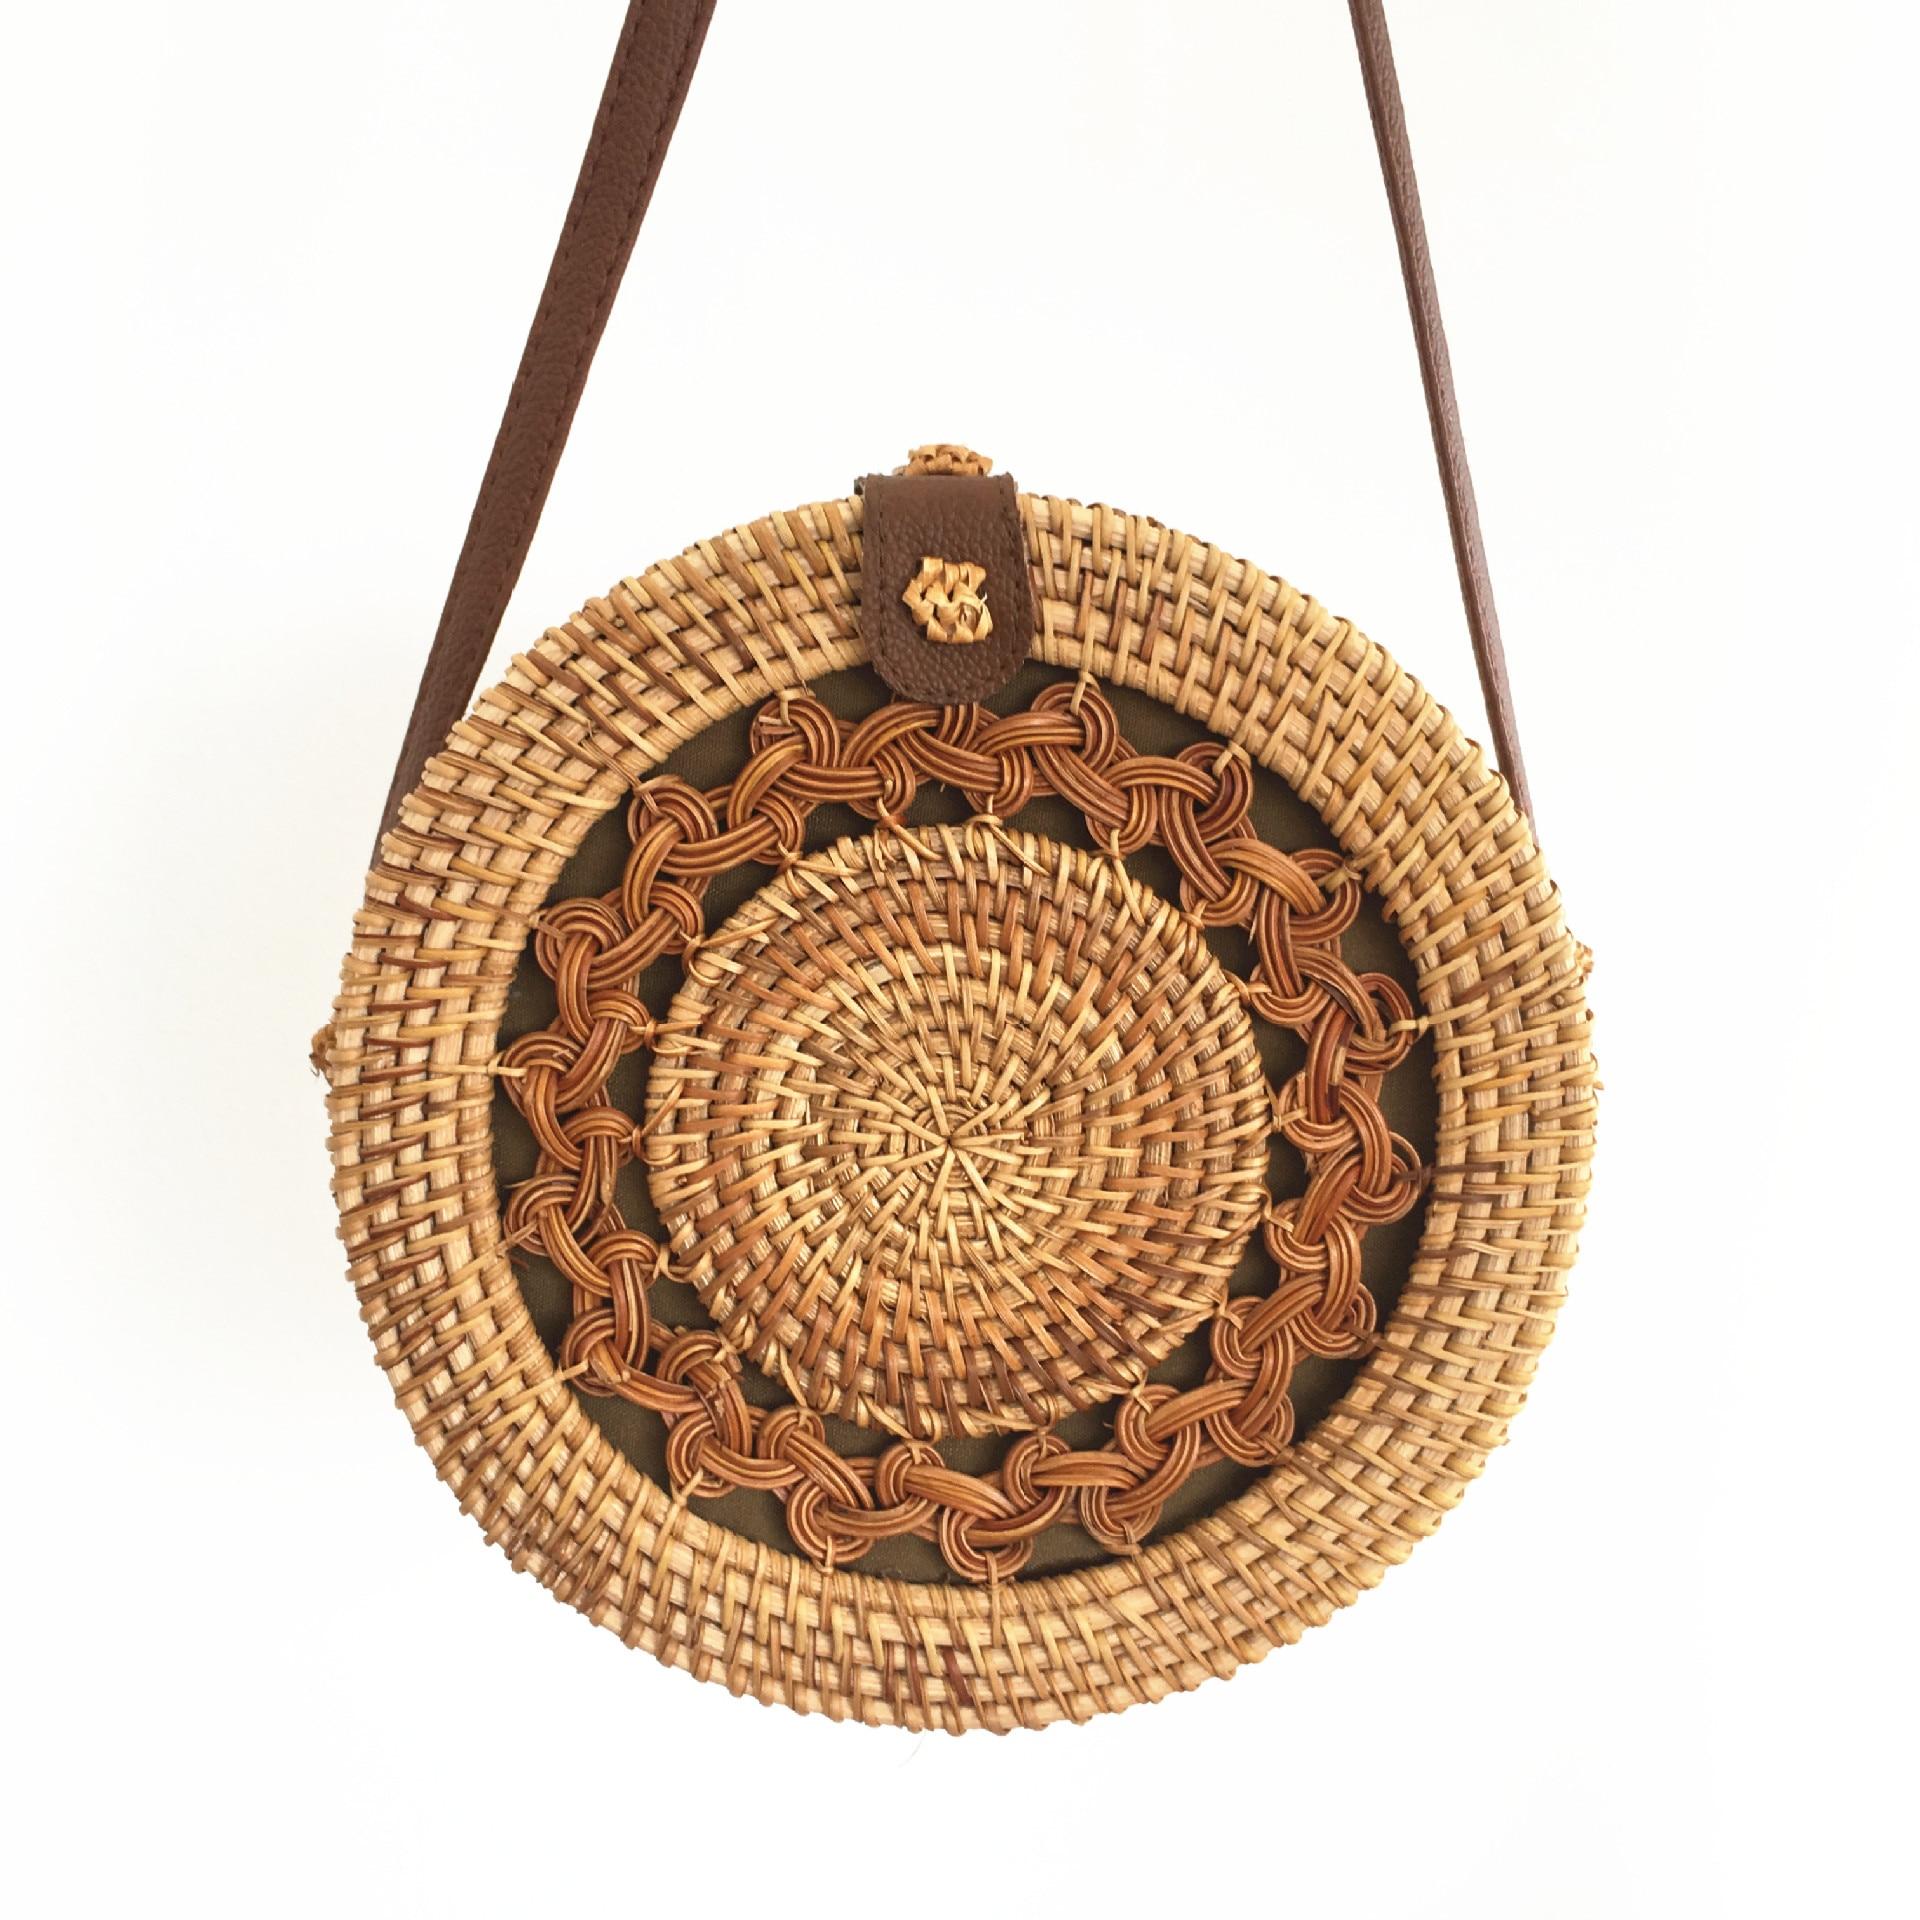 Rattan Bags Bali Shoulder Blosas Lady Handbags Round Beach Crossbody Bags Womans Bags Brand Designers 2019 Сумка